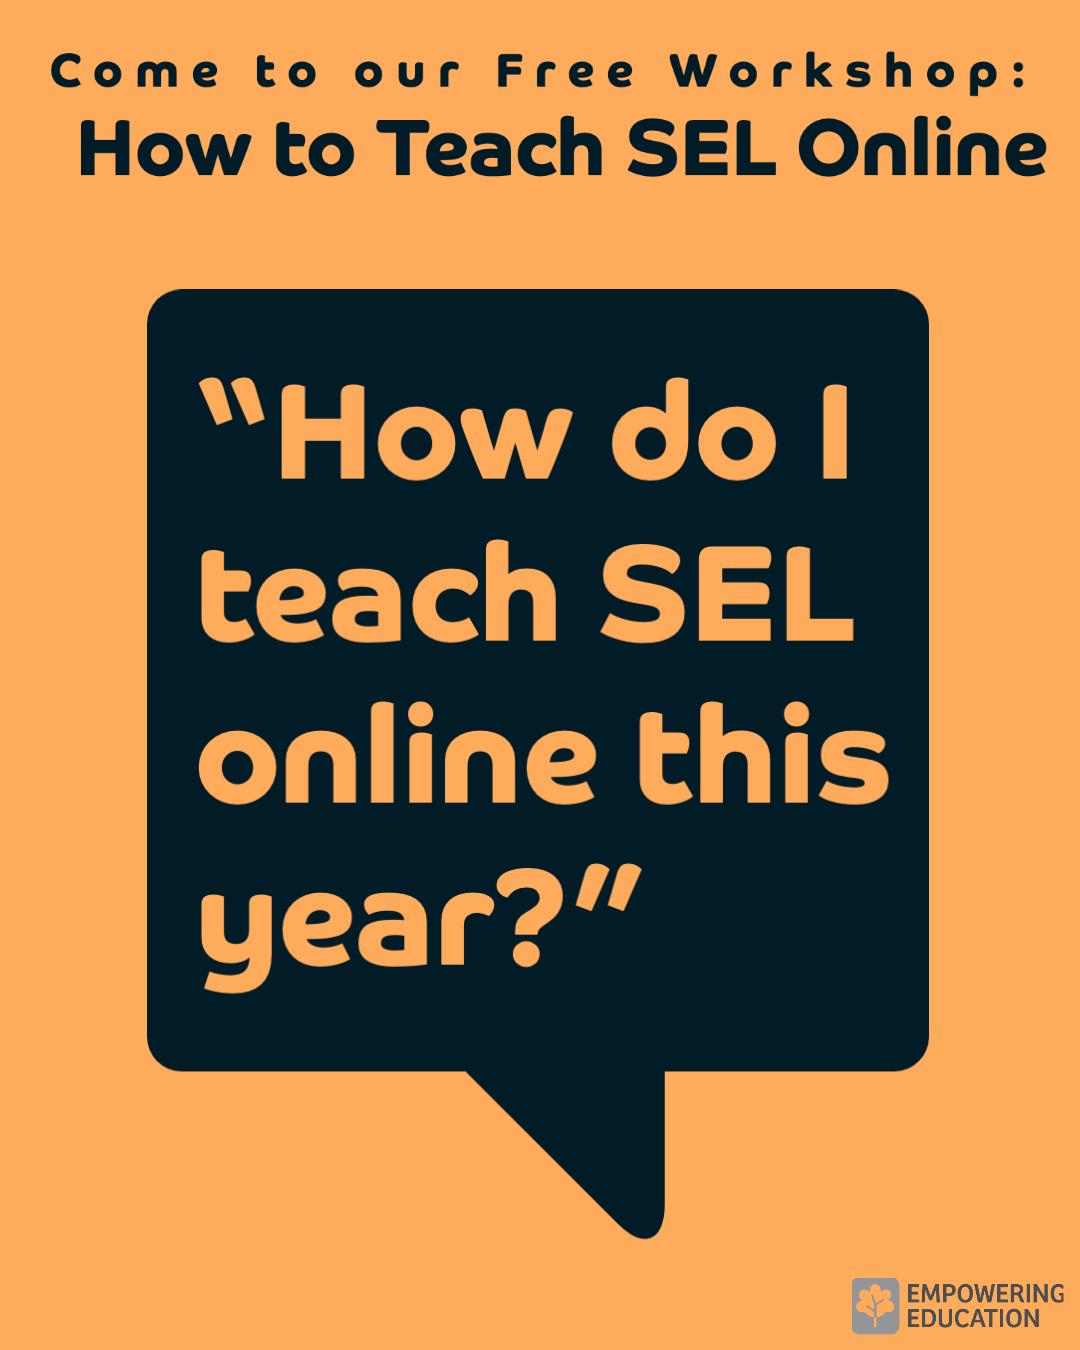 teaching sel online this year in orange